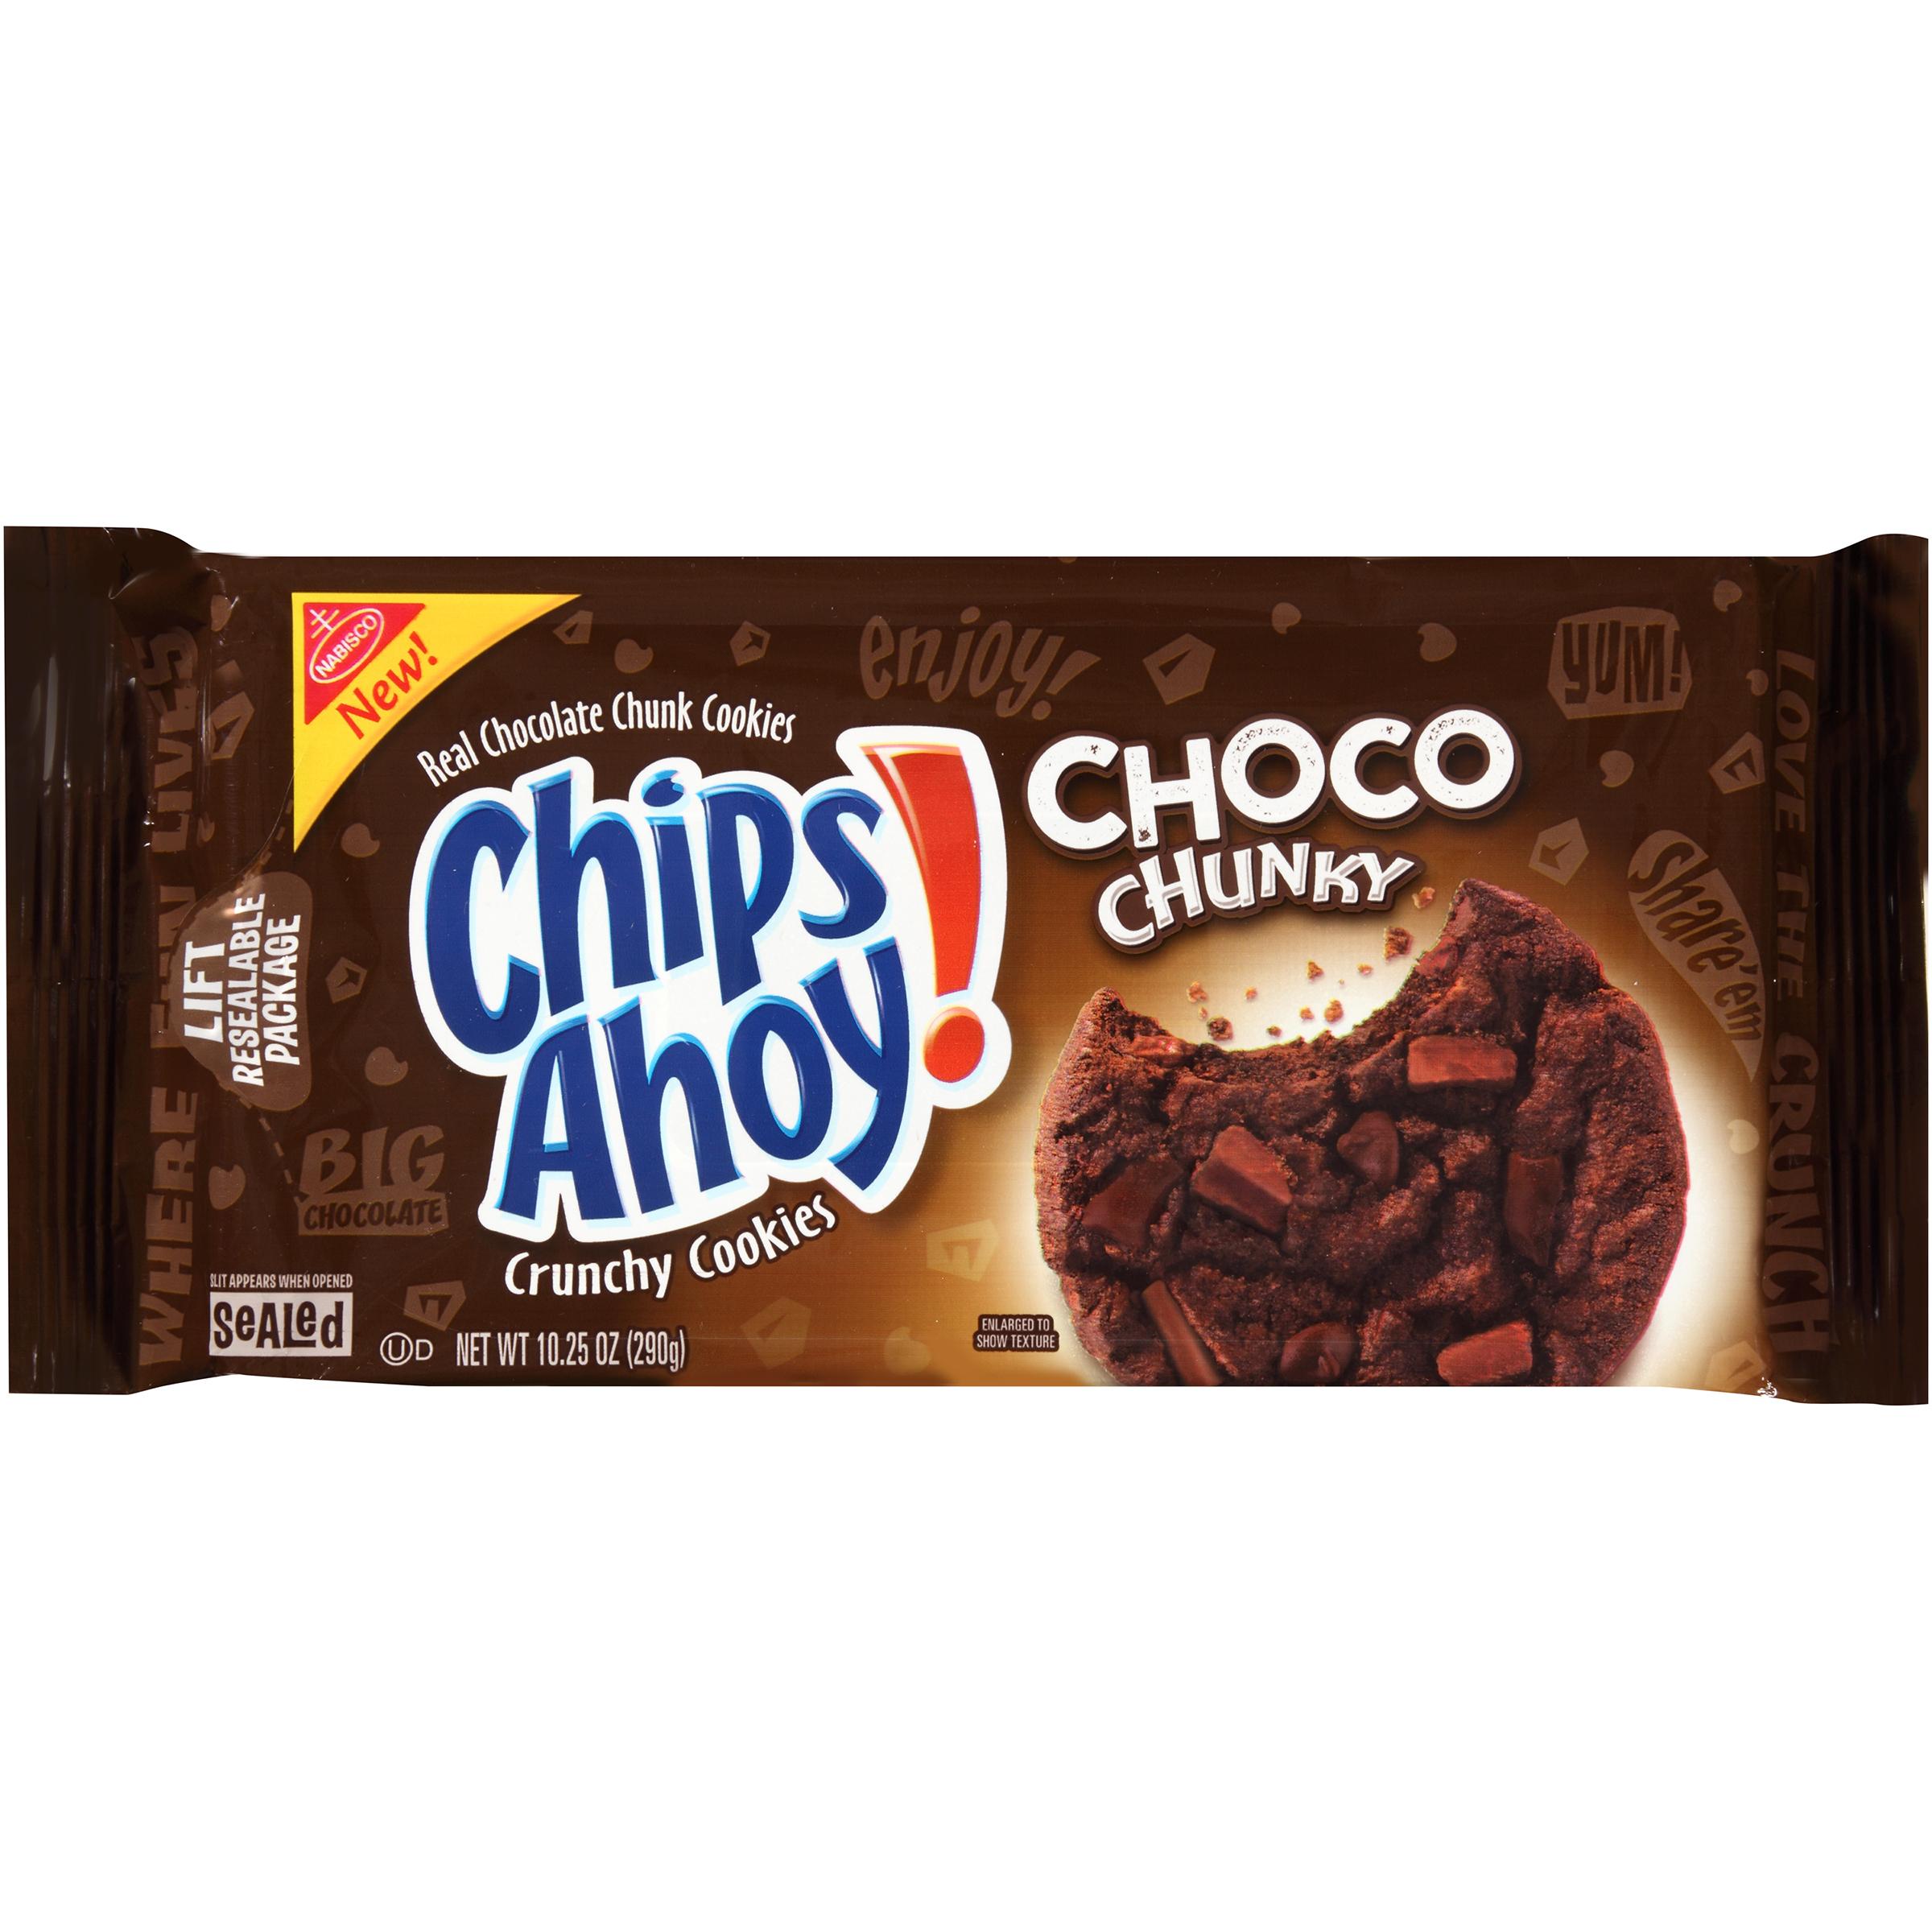 CHIPS AHOY! Choco Chunky Cookies 10.26 oz